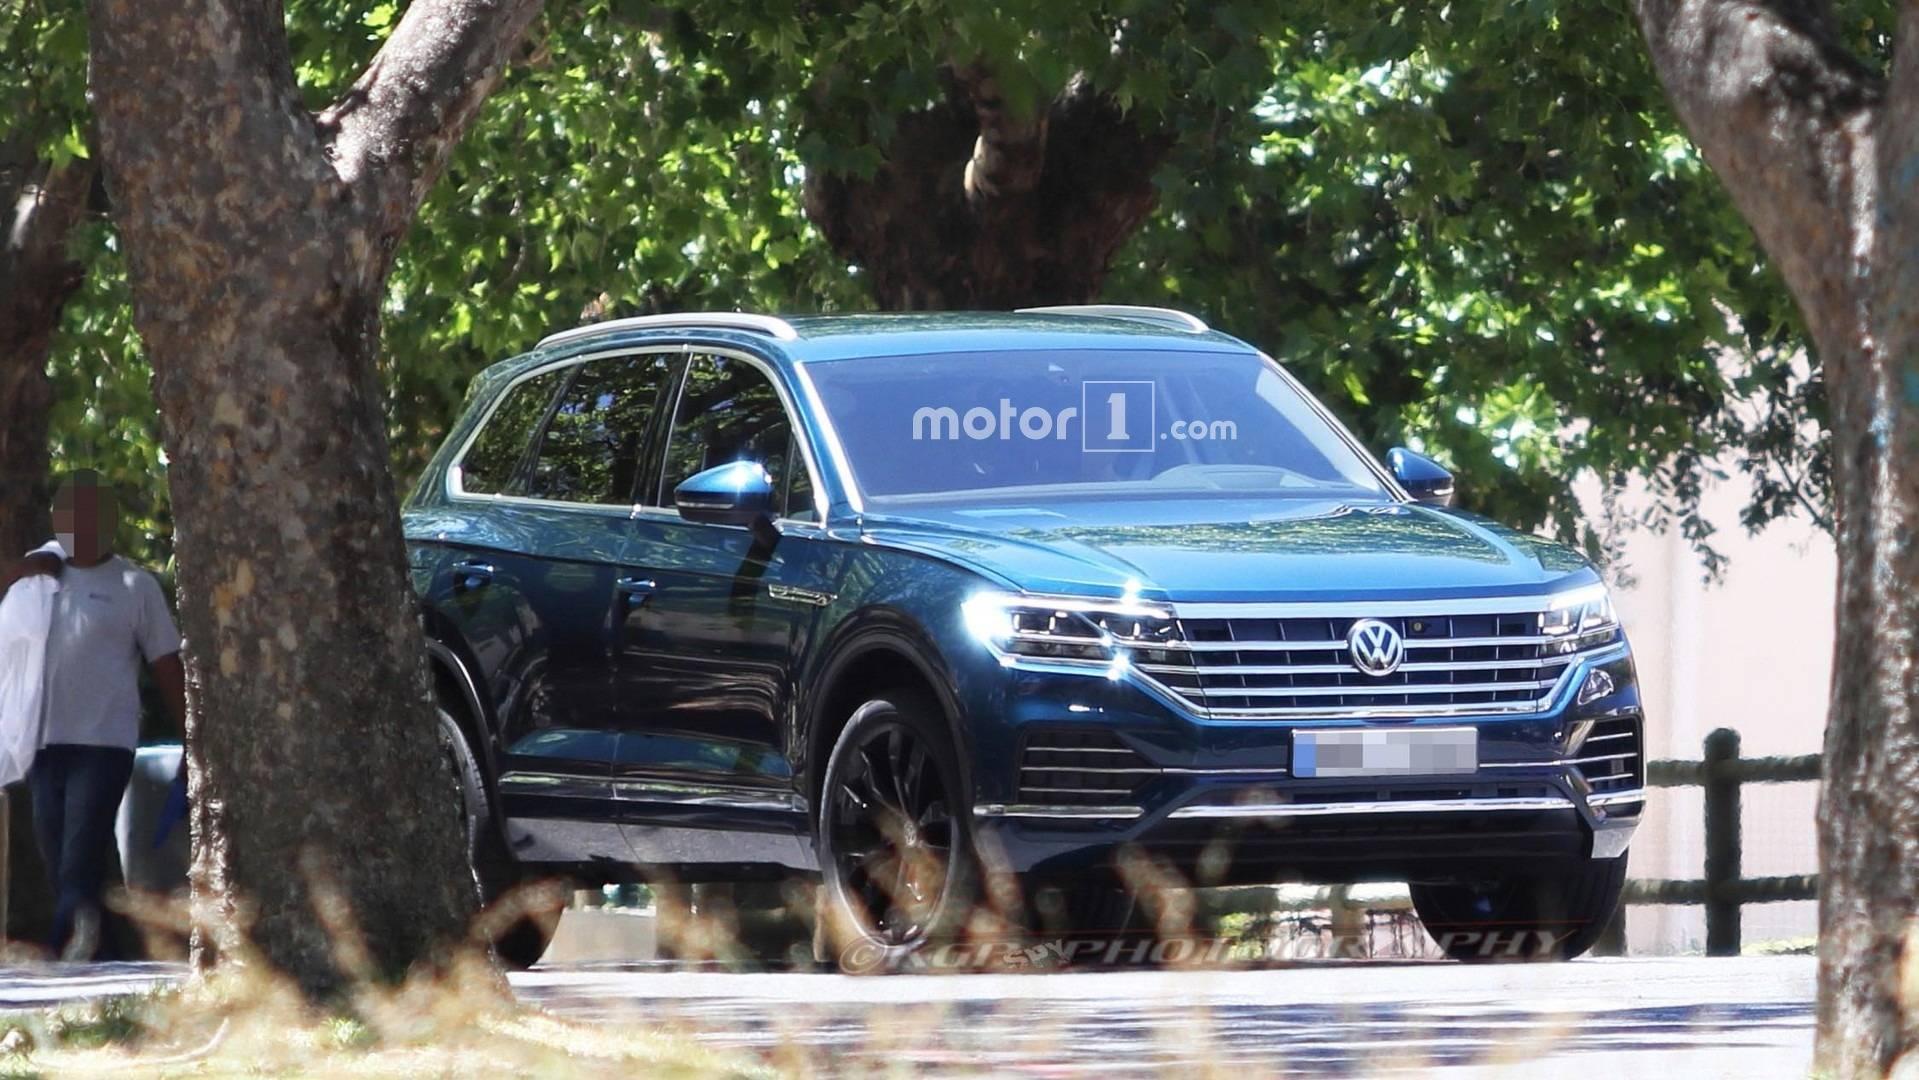 2018 VW Tiguan: Changes, Engines, 3-rd Row Seats, Price >> 2019 Vw Touareg Details Emerge Longer Wider Lighter 7 Seats